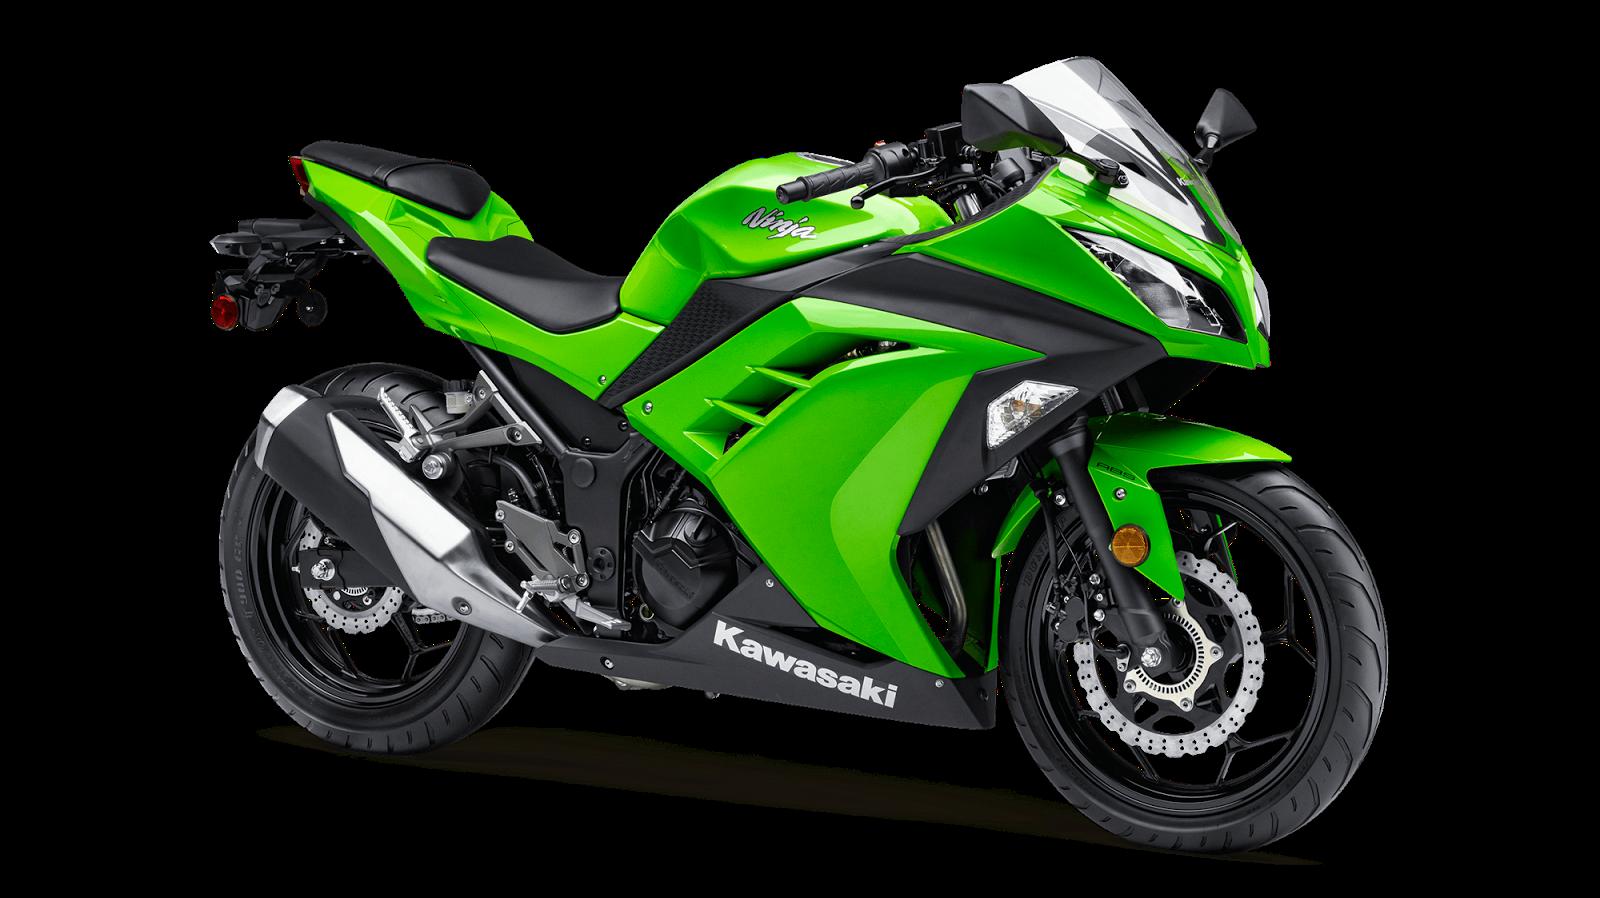 2015 Kawasaki Ninja 300 ABS price and Specifications ...